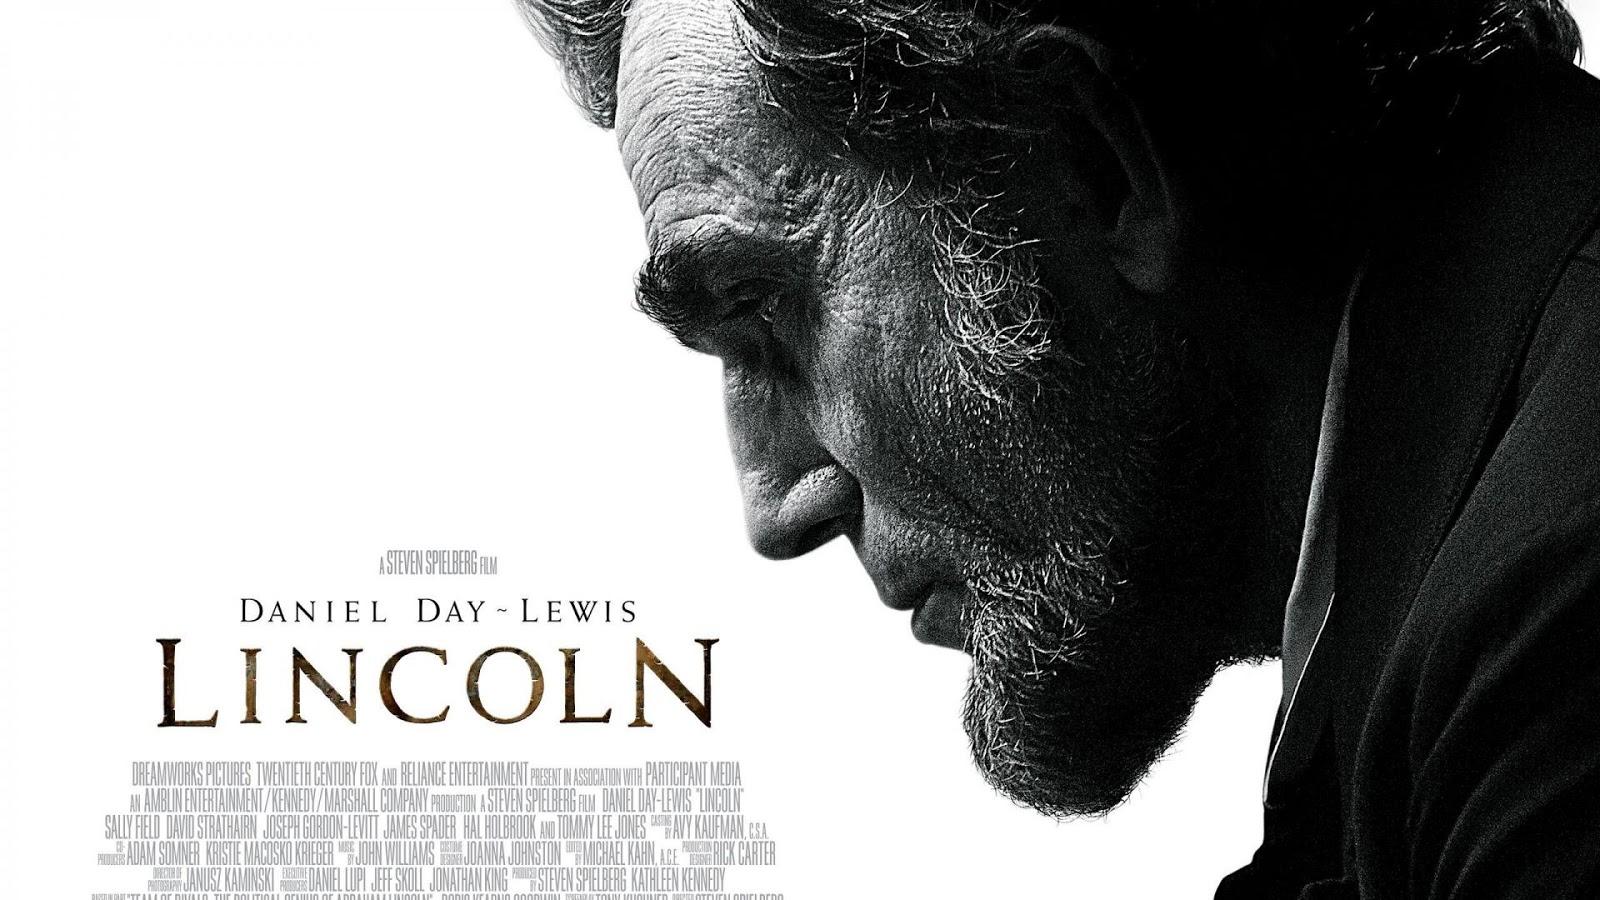 http://1.bp.blogspot.com/-2yWrwHNyvrc/URIQb6JB5_I/AAAAAAAABaM/4n-pg-qxS3o/s1600/lincoln-movie-poster-292583.jpg